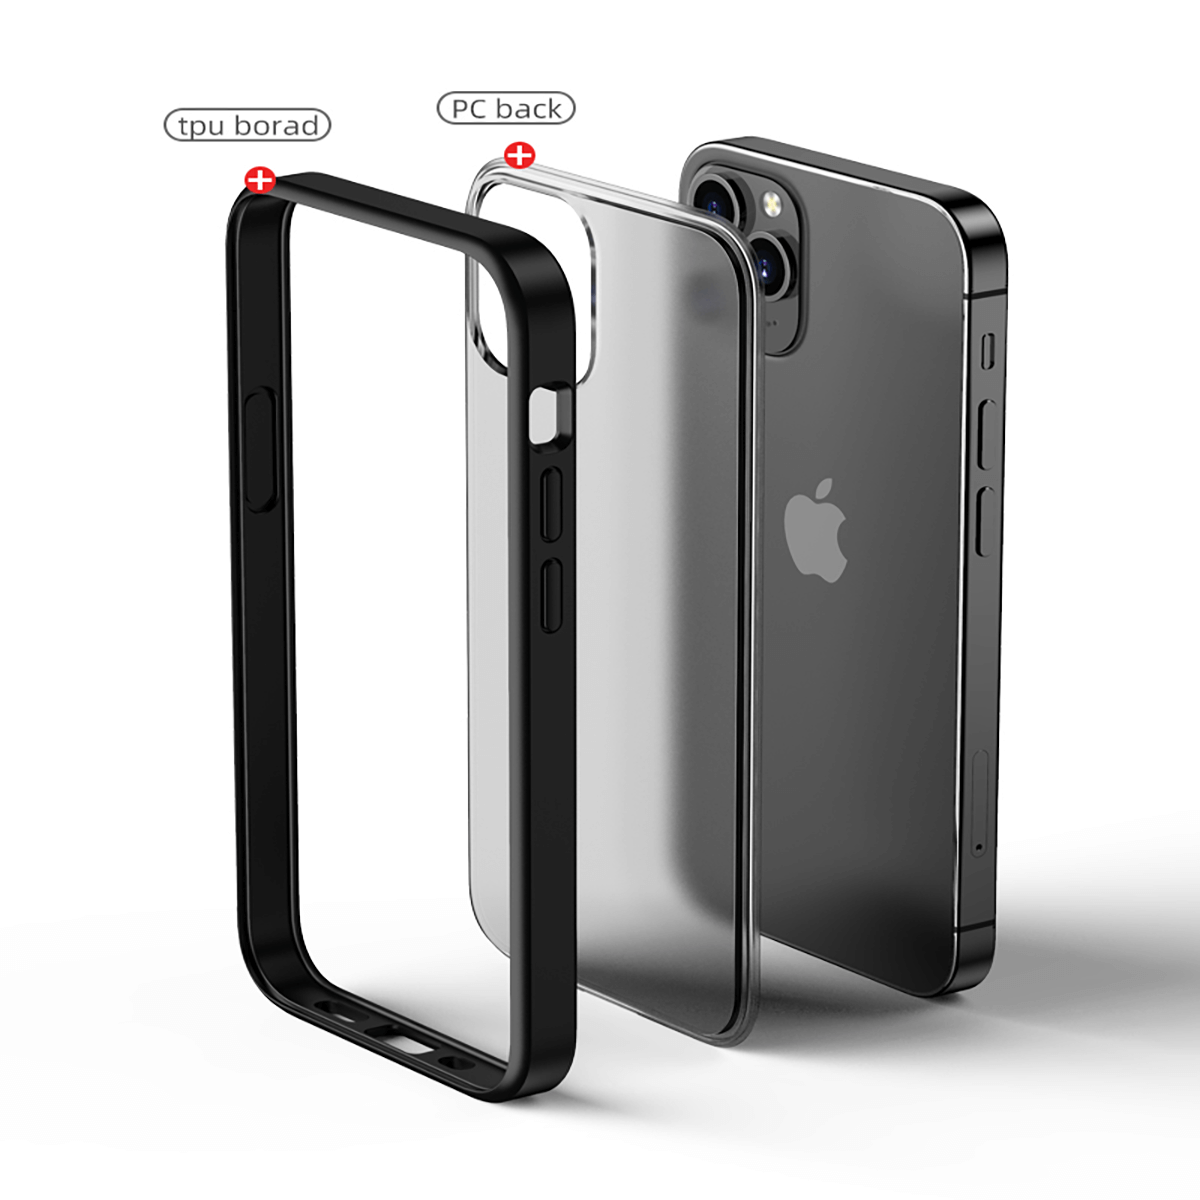 iPhone 12 Pro Max için spada Shadow Lacivert kapak